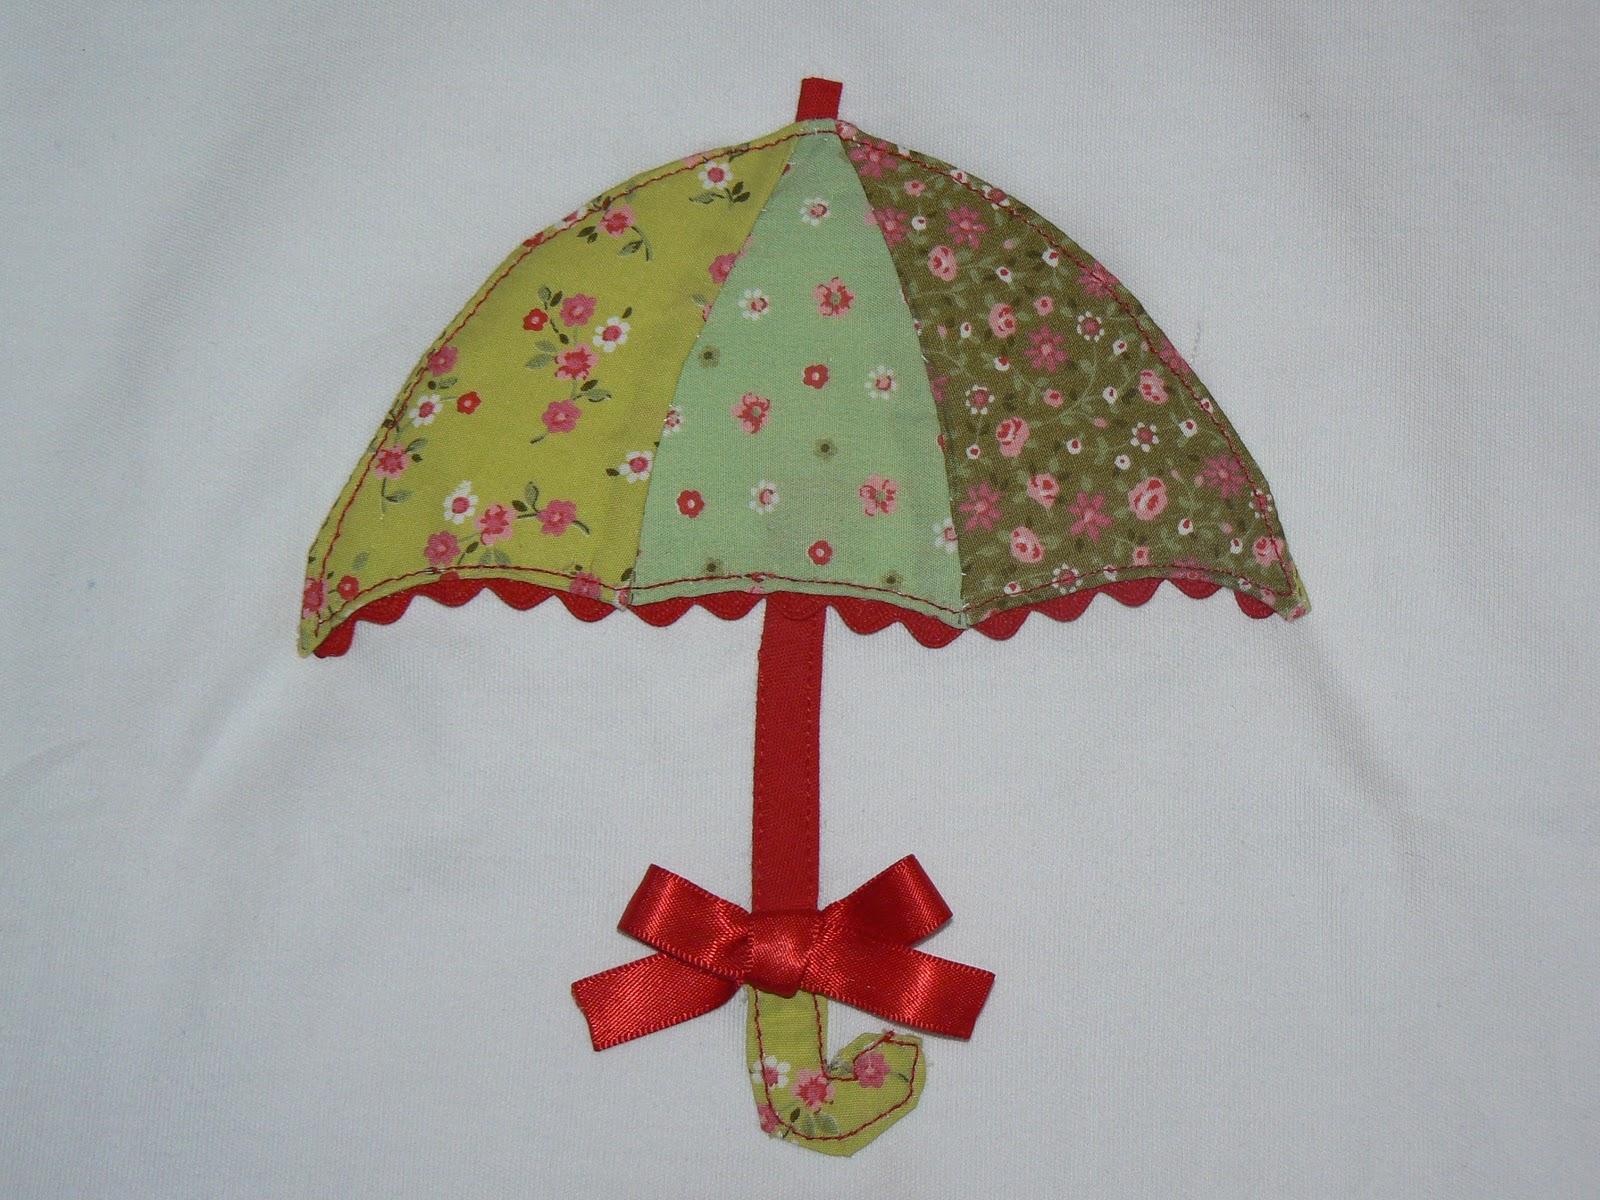 Telas de colores paraguas de dise o para los d as de lluvia - Tela de paraguas ...